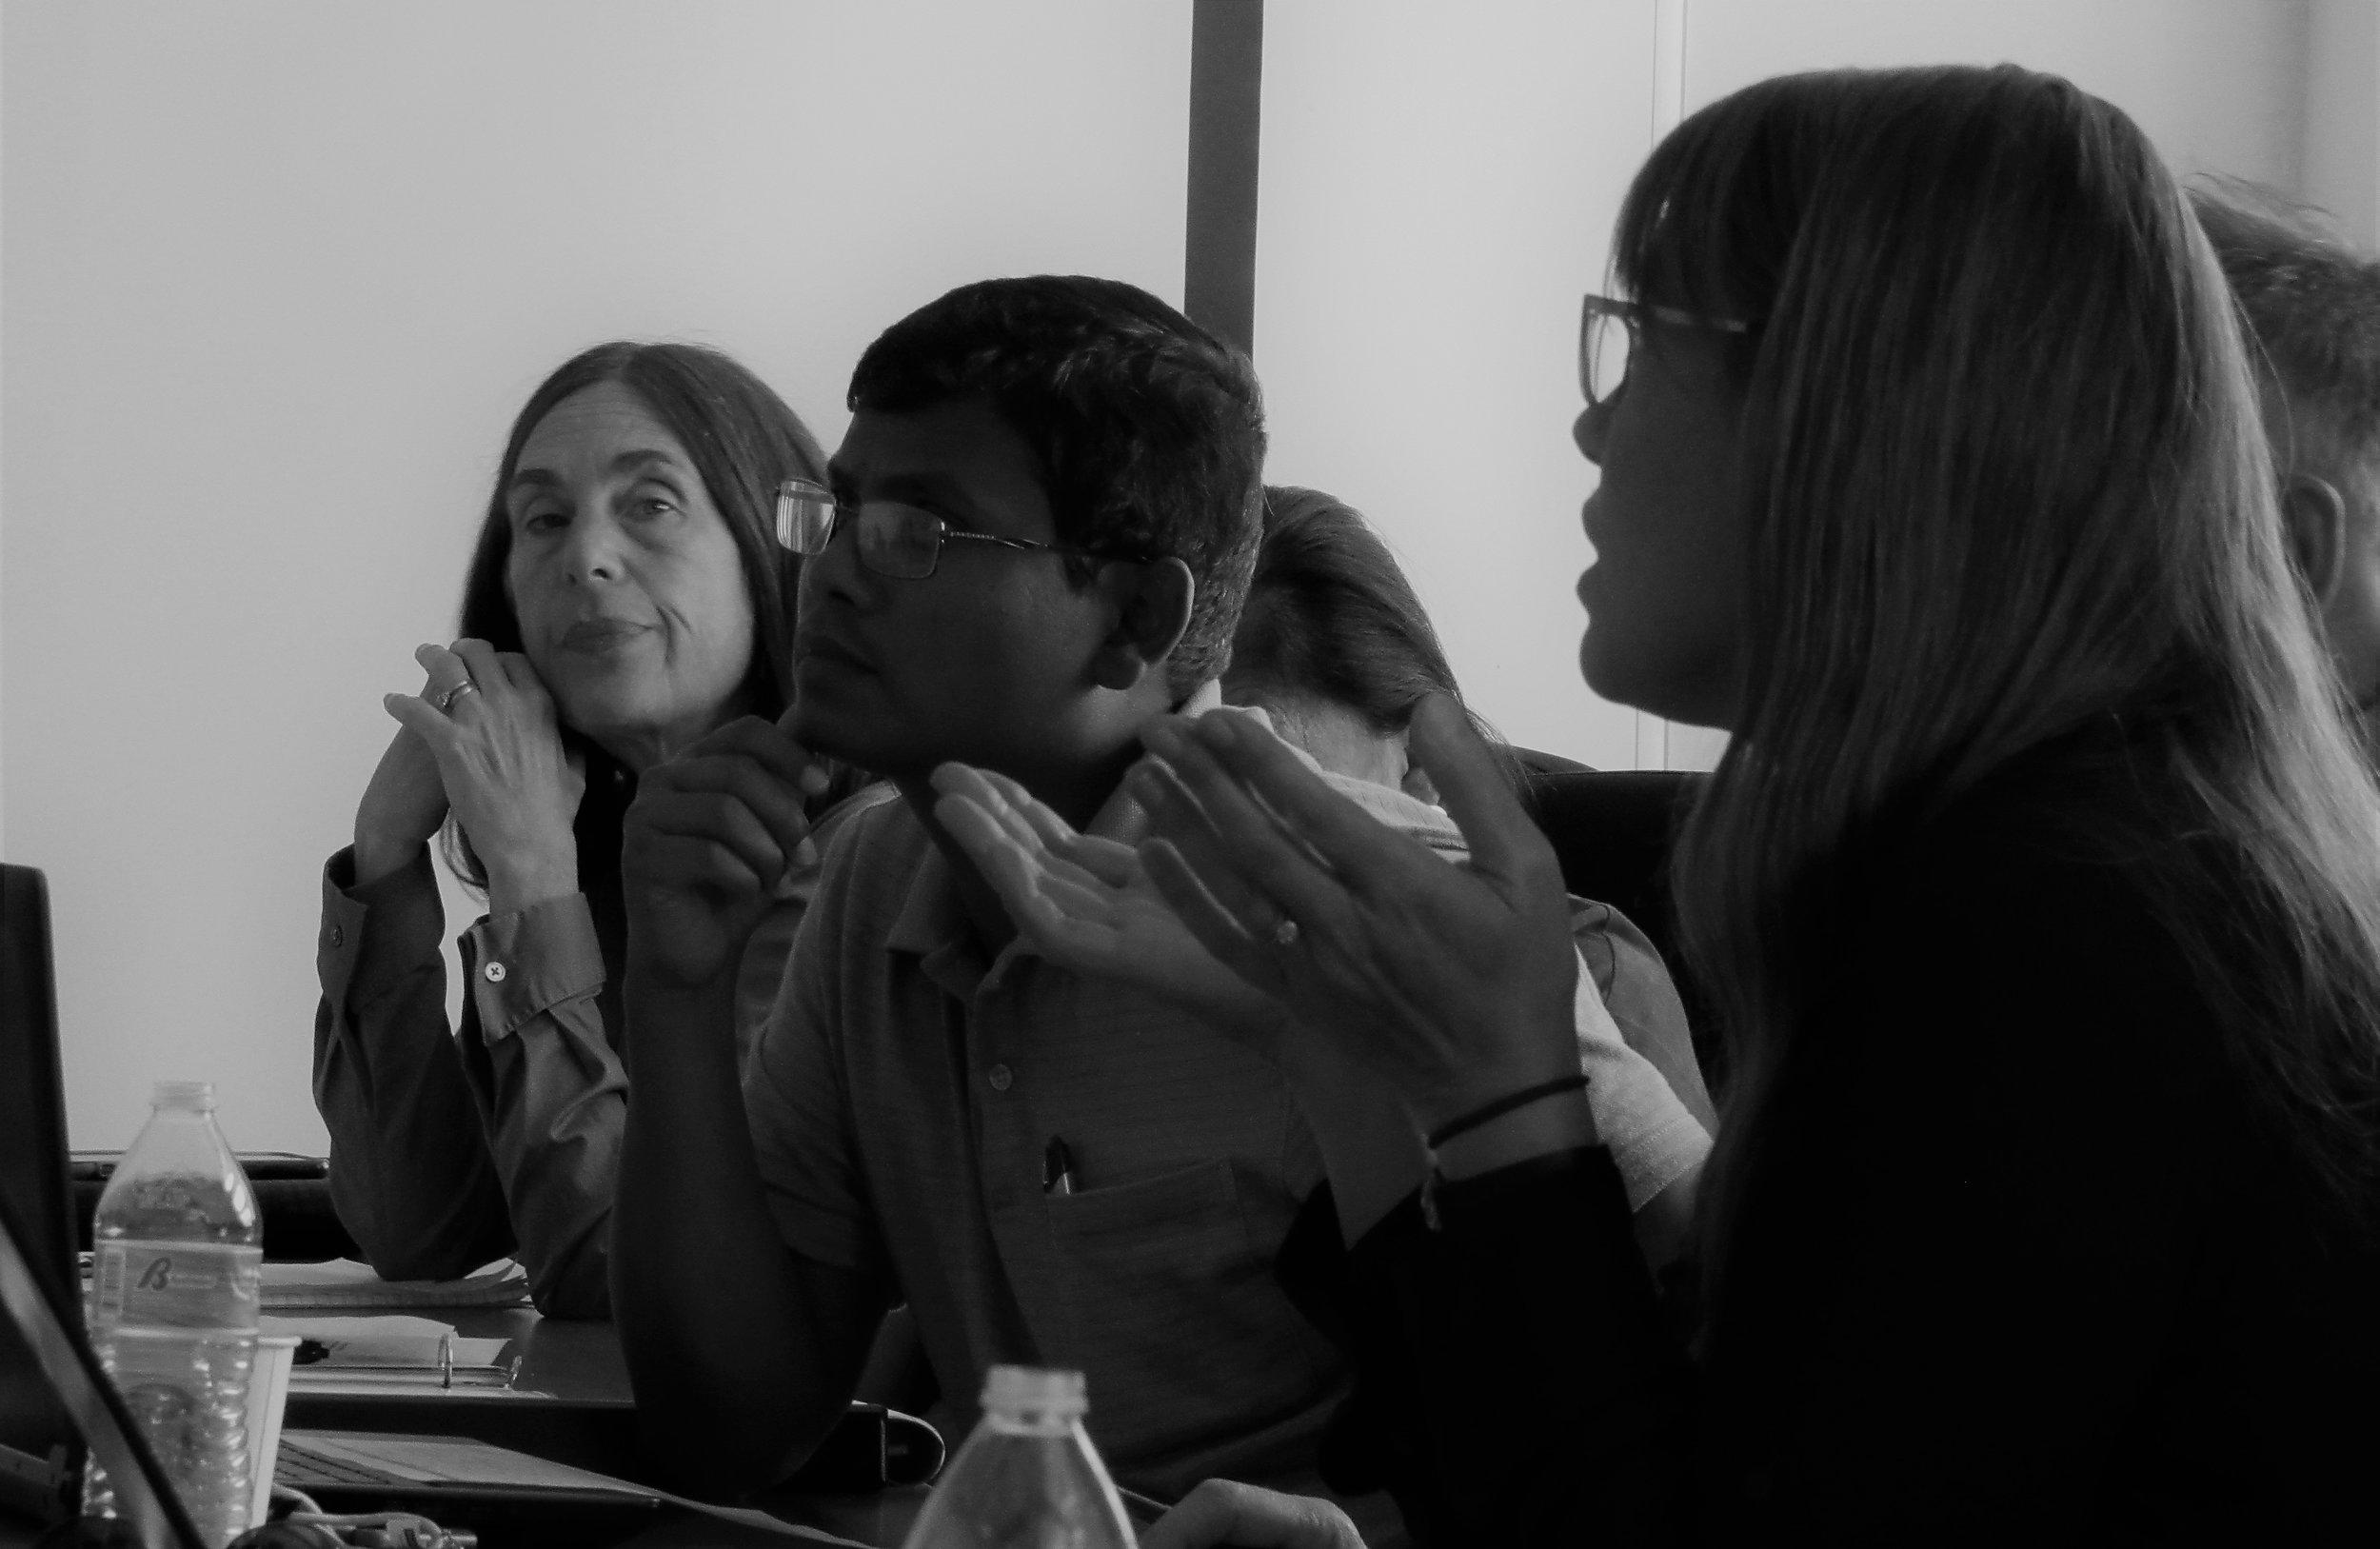 Agency - (From L to R) Jill Grant (NEPA Legal Counsel), Binod Chaudhary (NEPA Superfund), Freyja Knapp (USEPA Region IX, Remedial Project Manager).